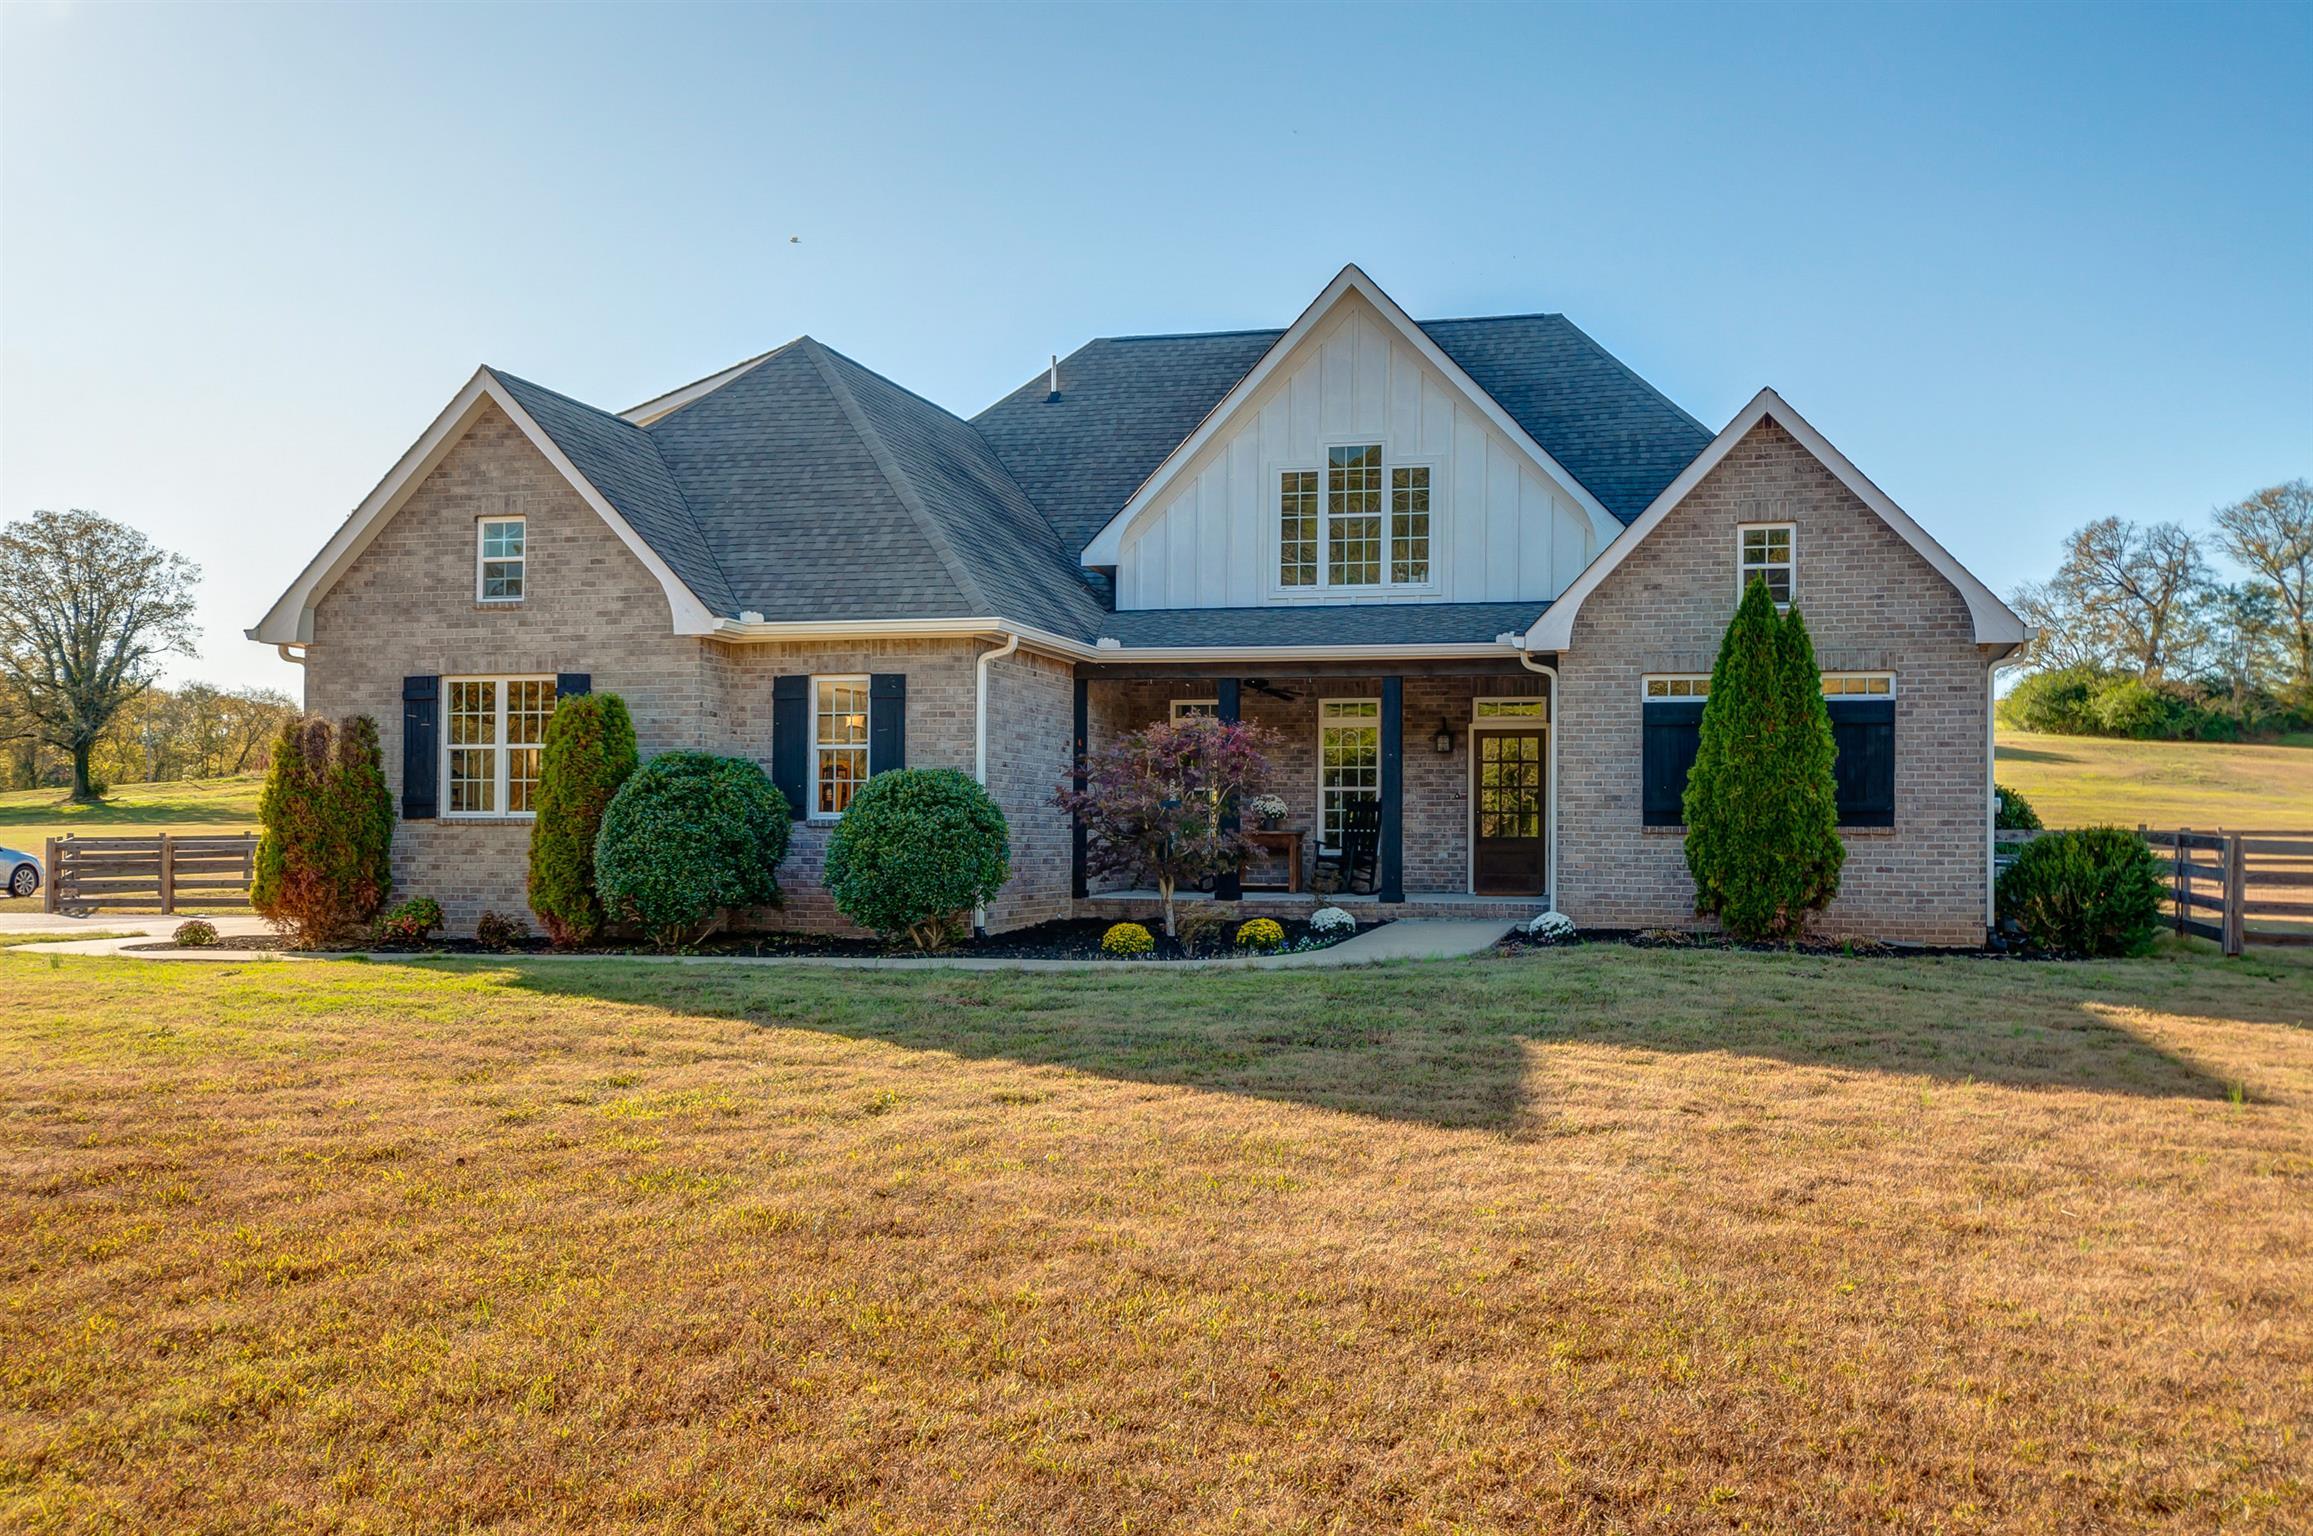 431 Carters Creek Pike, Columbia, TN 38401 - Columbia, TN real estate listing